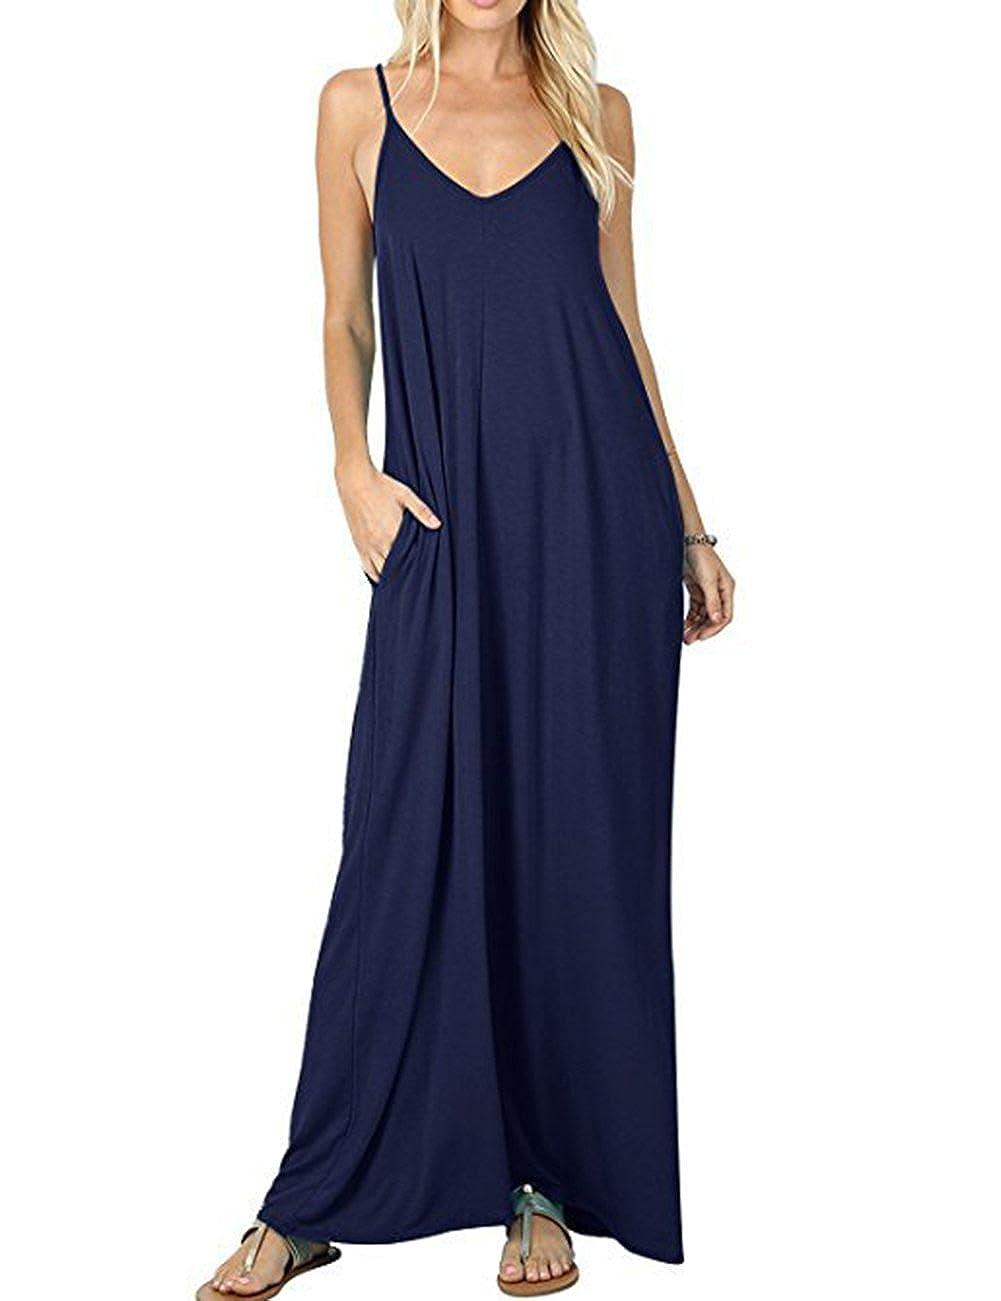 Navy KOSMOO Women's Sleeveless Loose Plain Maxi Dresses Casual Long Dresses